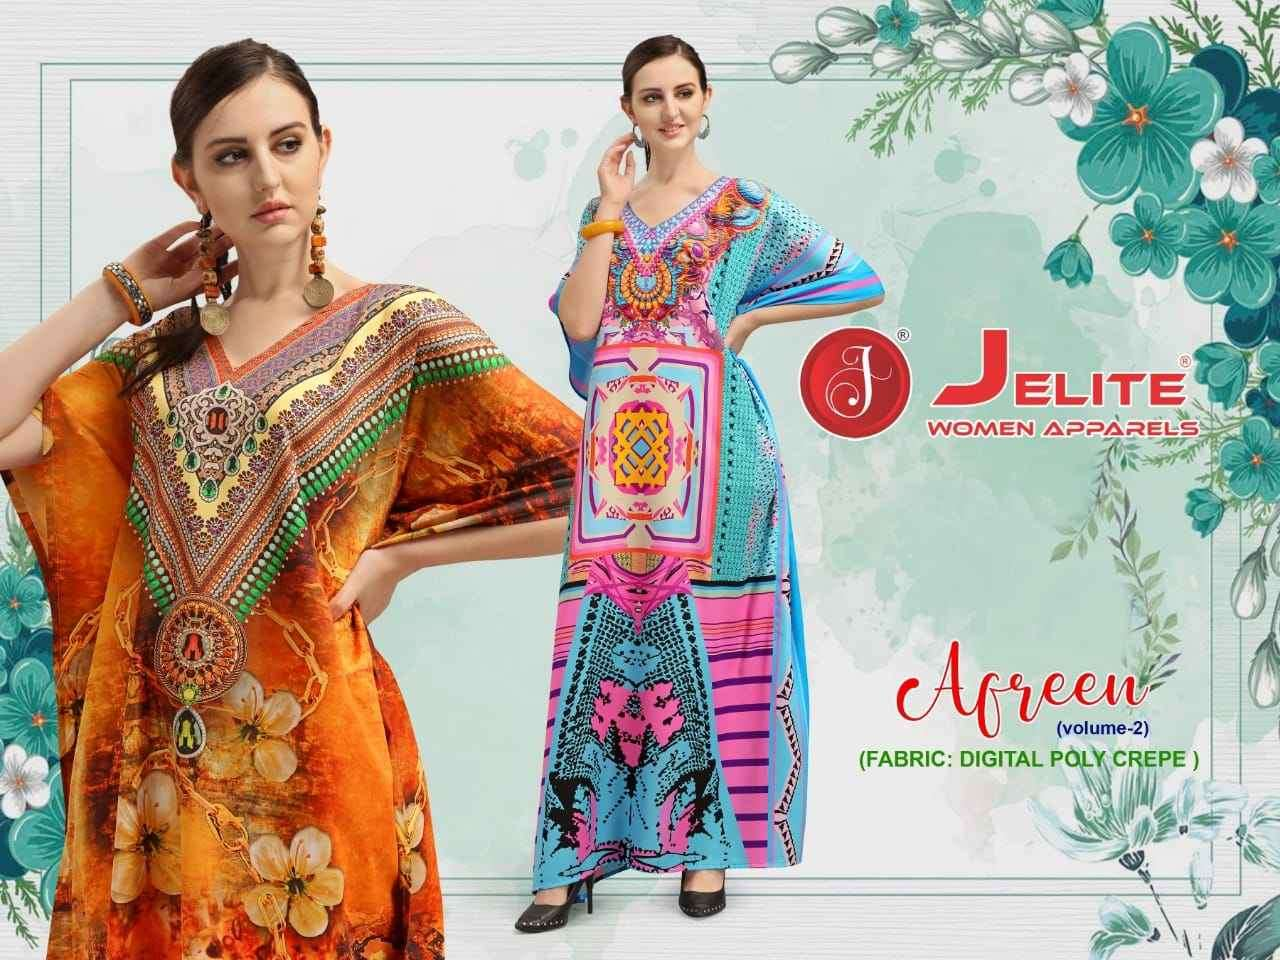 Jelite Afreen Vol 2 Digital Print Kaftan New catalog Supplier